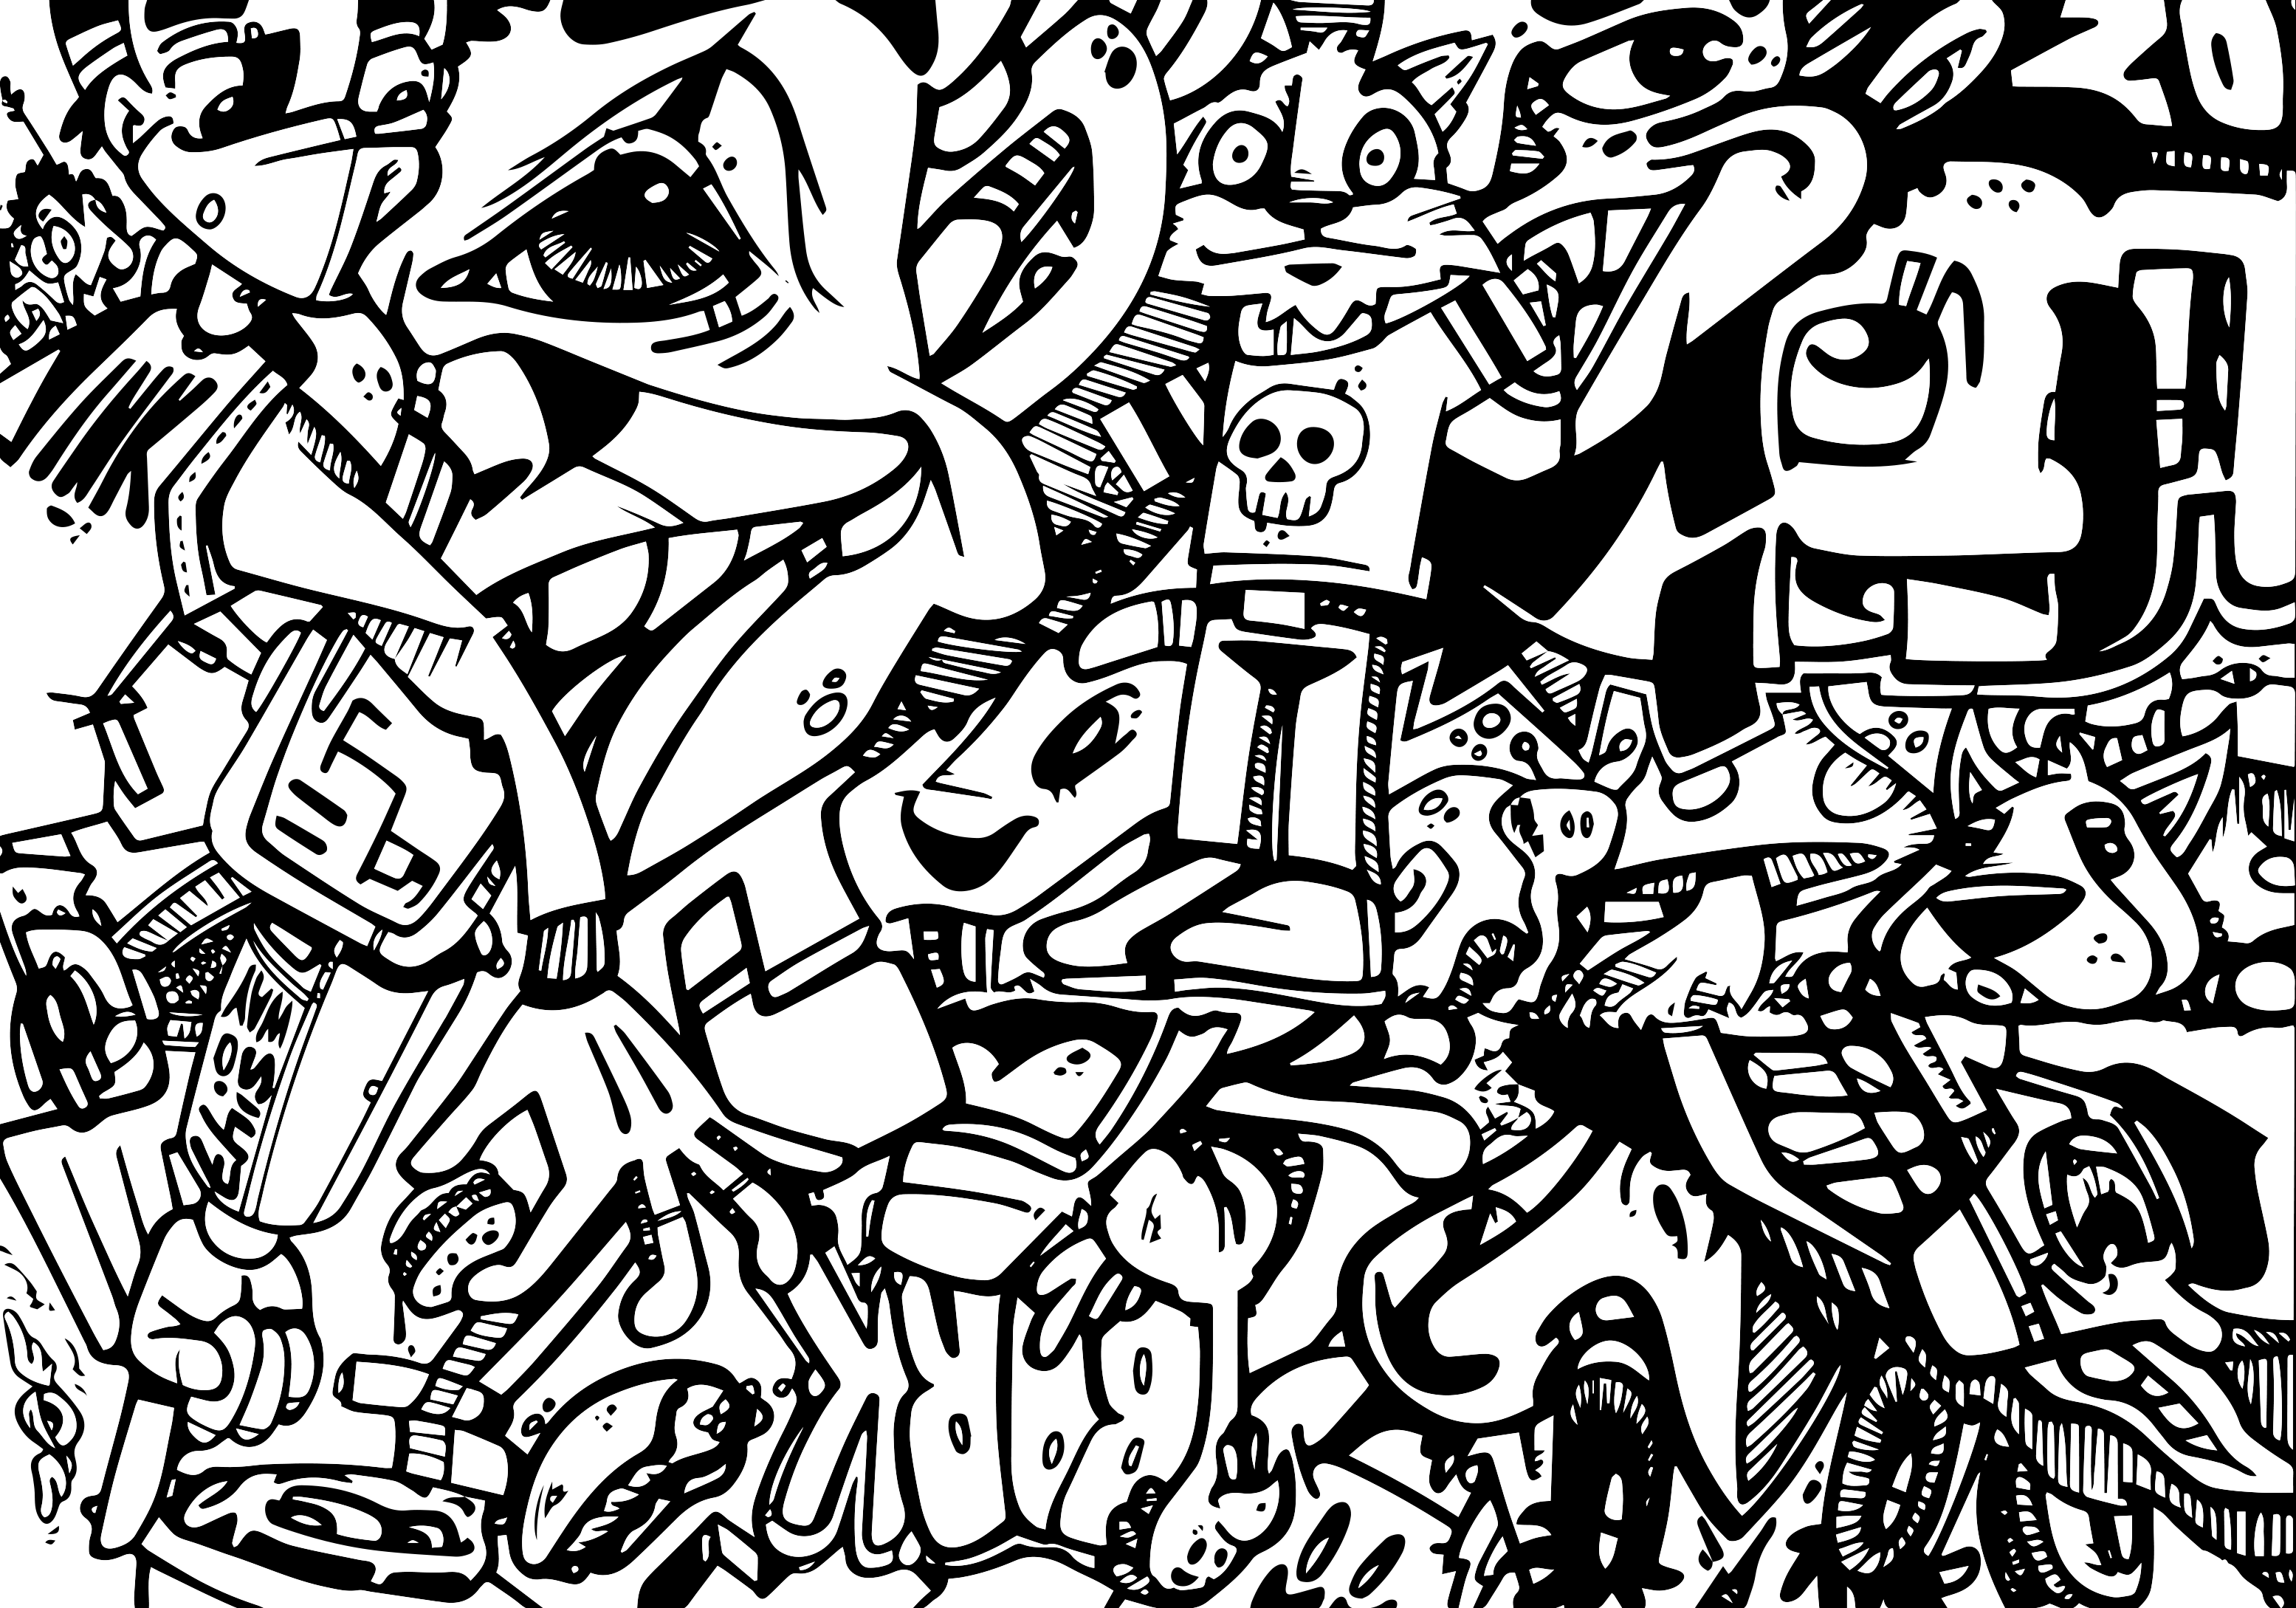 Even more doodles!